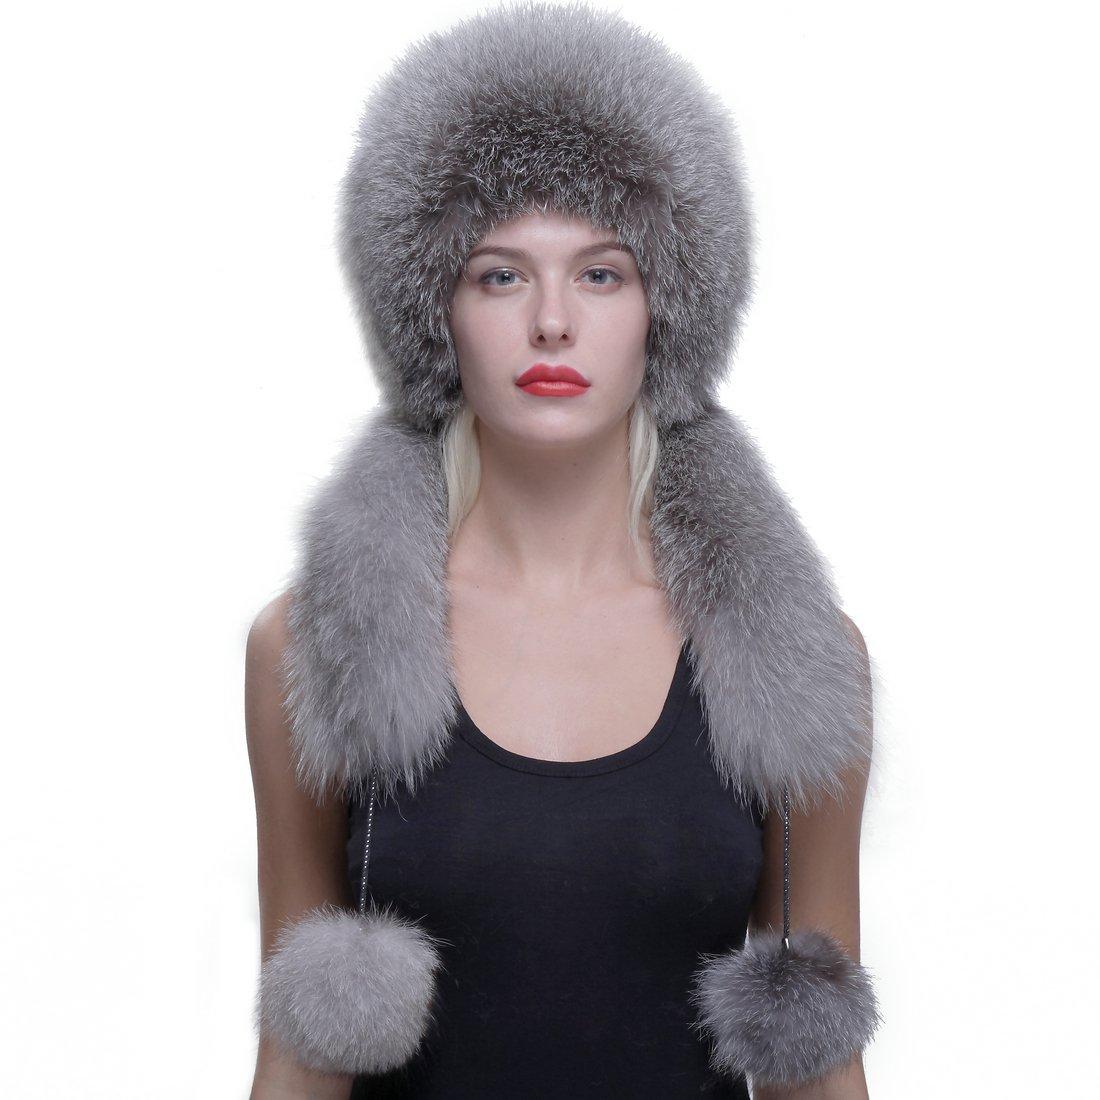 URSFUR Real Fox Fur Roller Hat with Rabbit Top Fox Ear Flap Pom Pom Multicolor